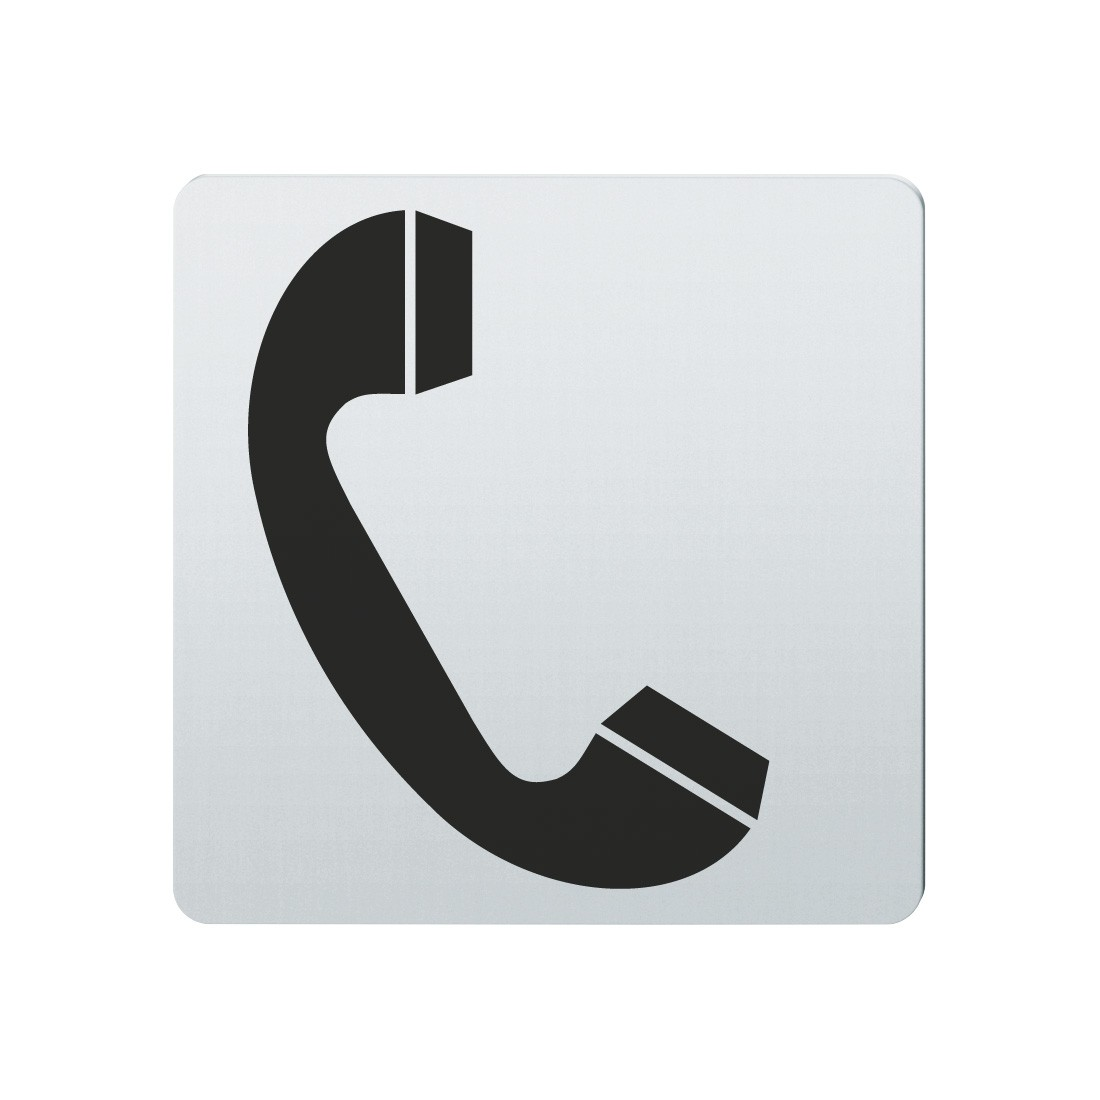 FSB Hinweiszeichen Telefon Lasergraviert Edelstahl fein matt (0 36 4059 00200 6204)